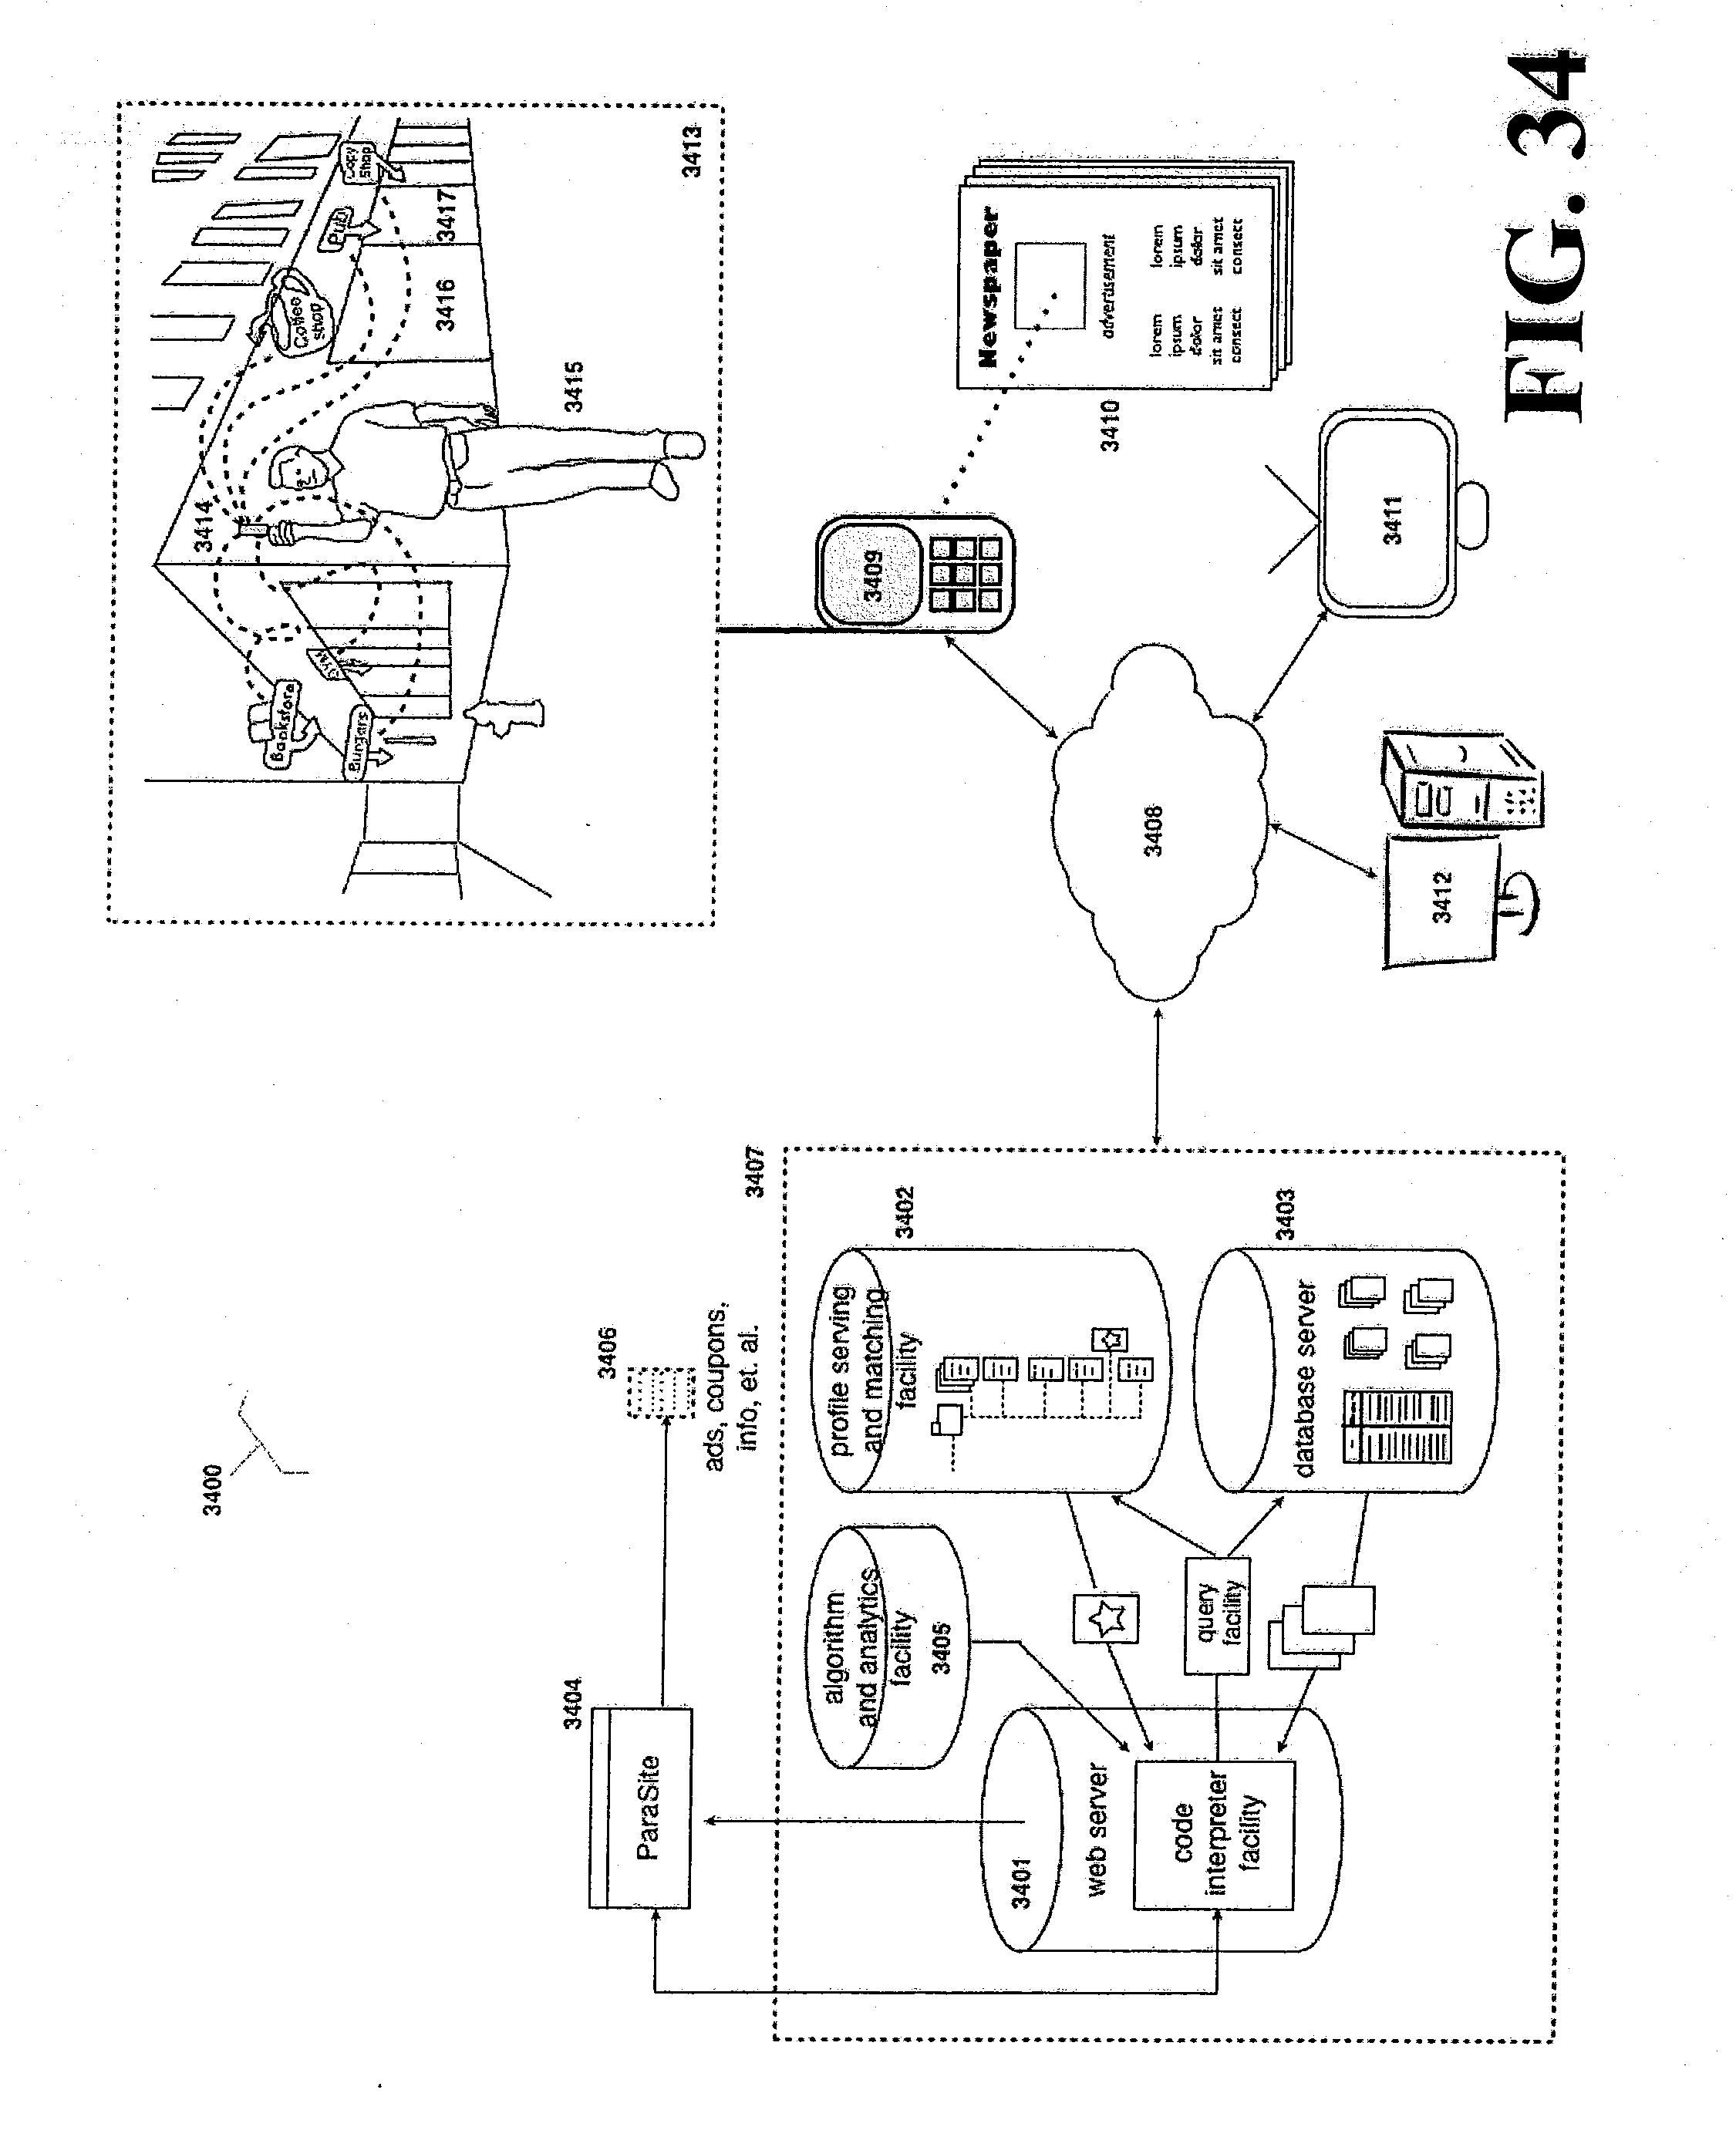 bonding csst gas line furthermore 1956 chevy wiring harness diagram rh 1 10 3 ludwiglab de